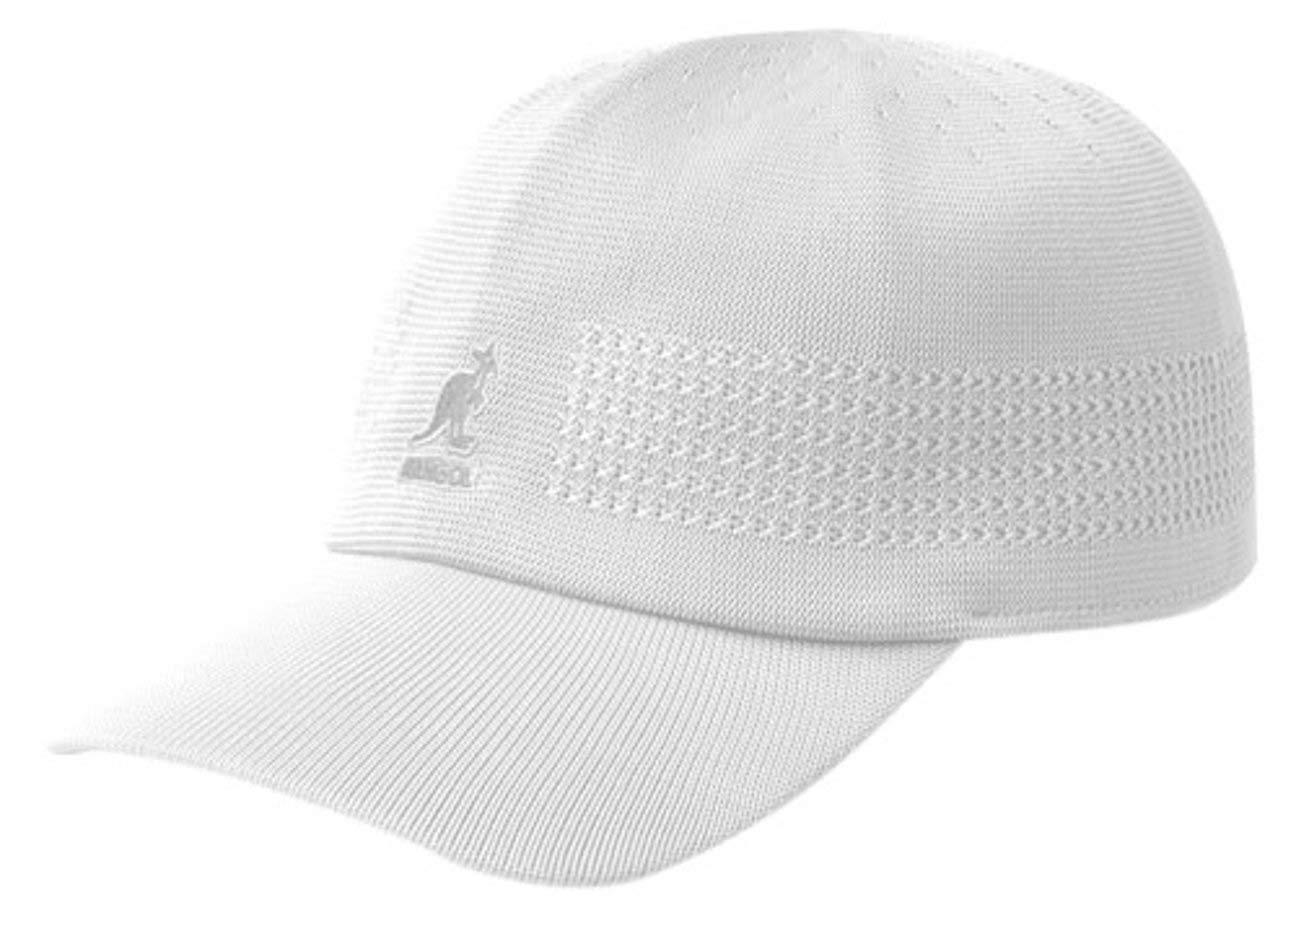 Kangol Tropic Ventair Spacecap Hat,White,M US